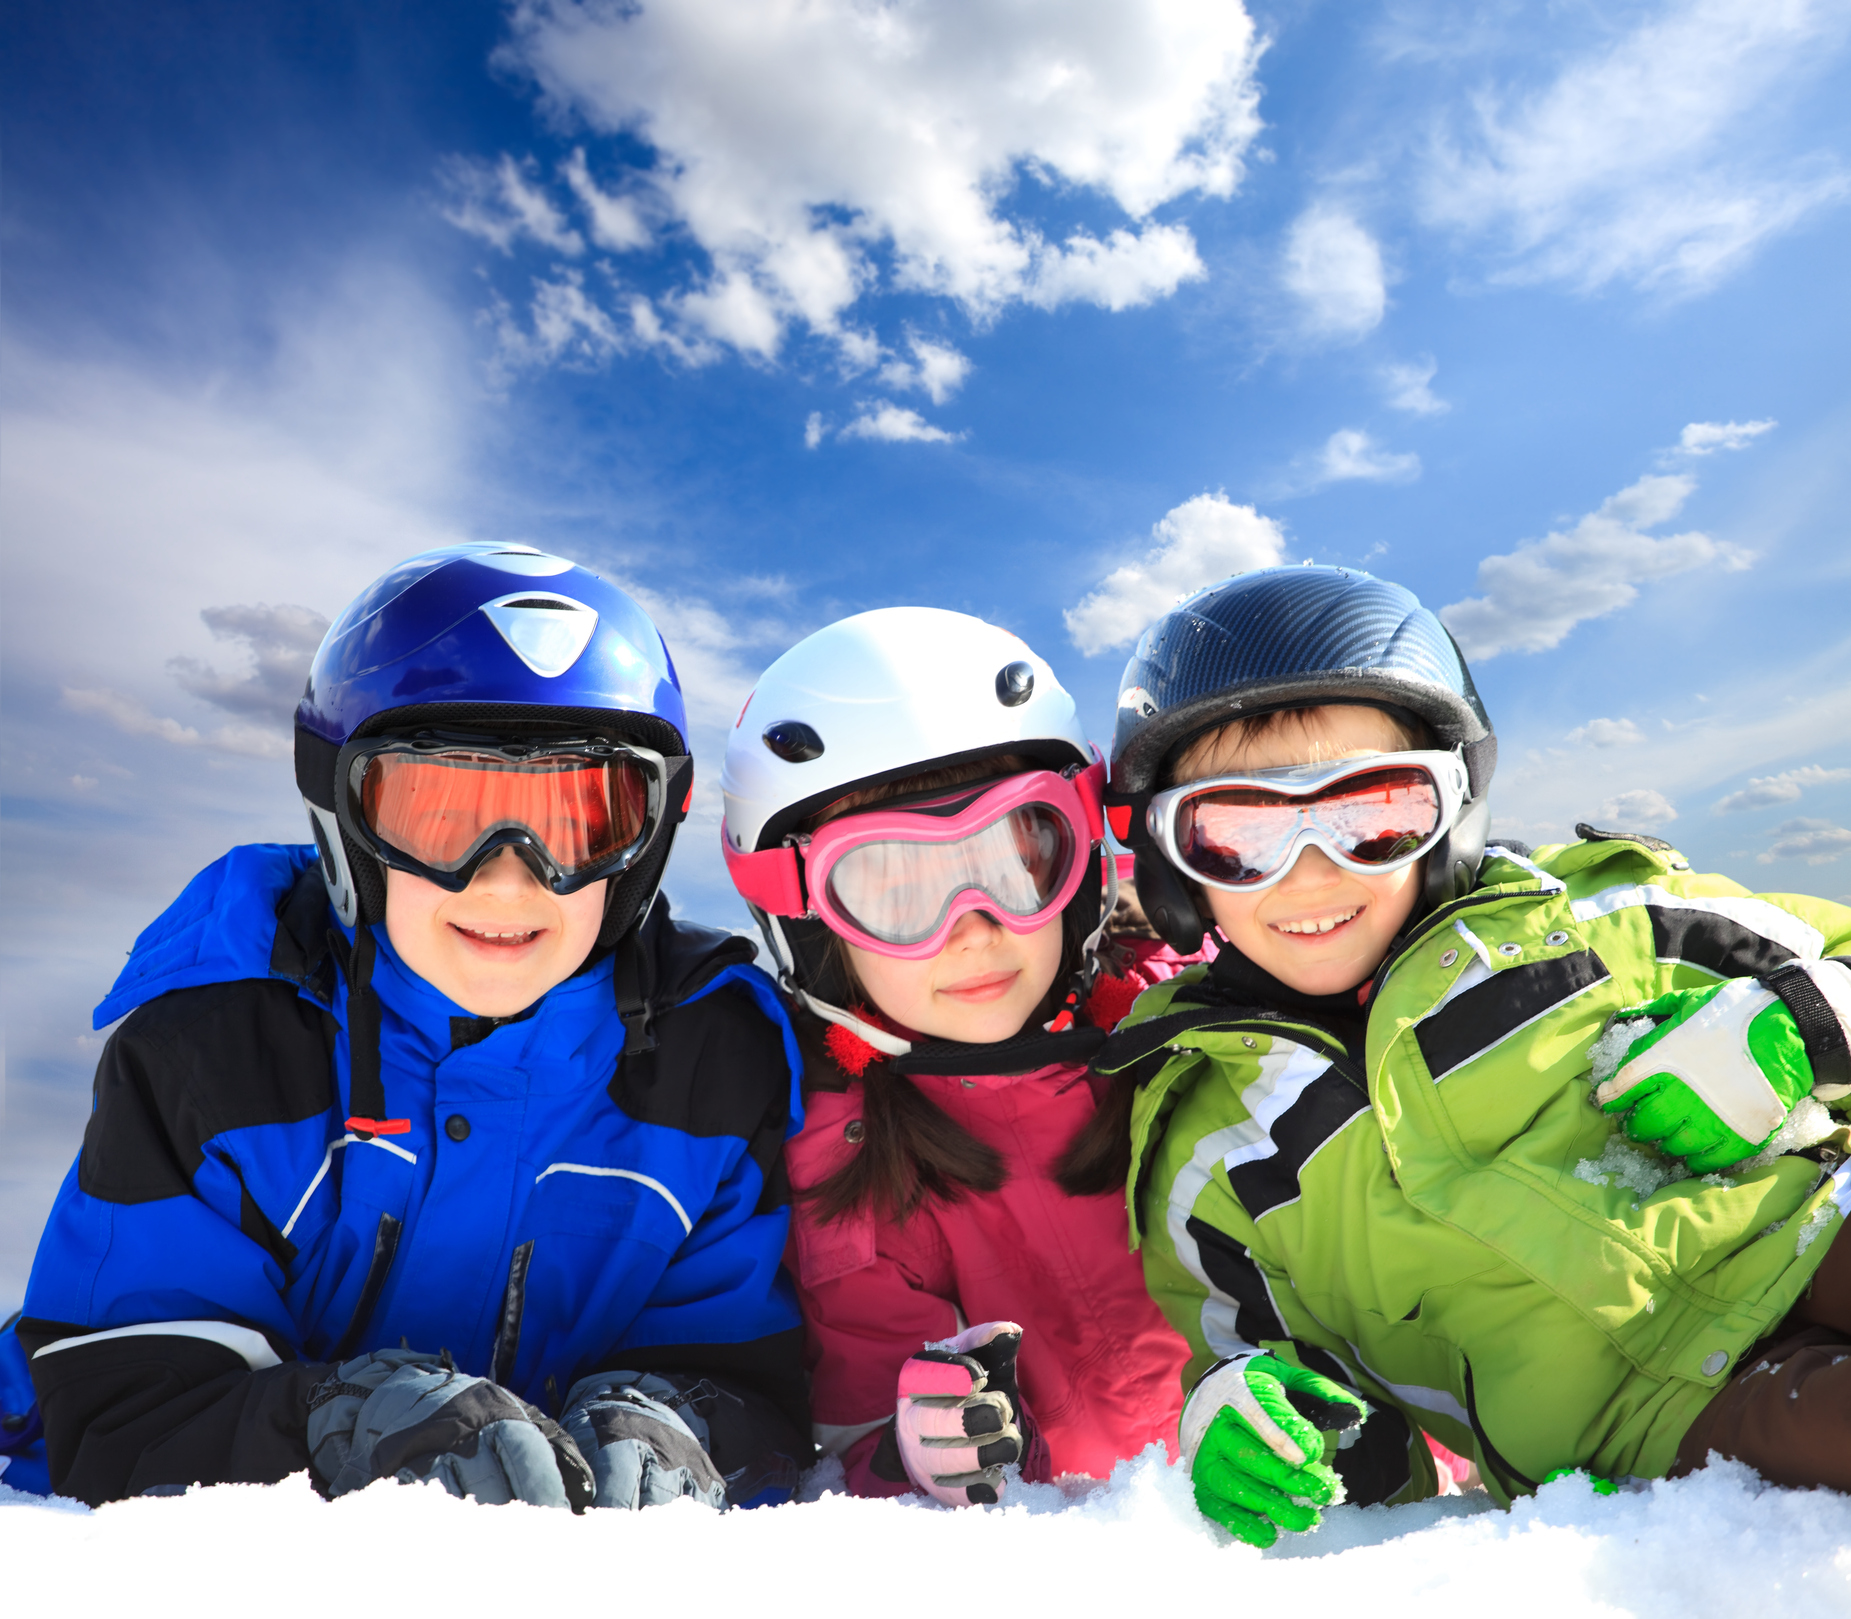 Consejos para comprar tu propio casco de esquí